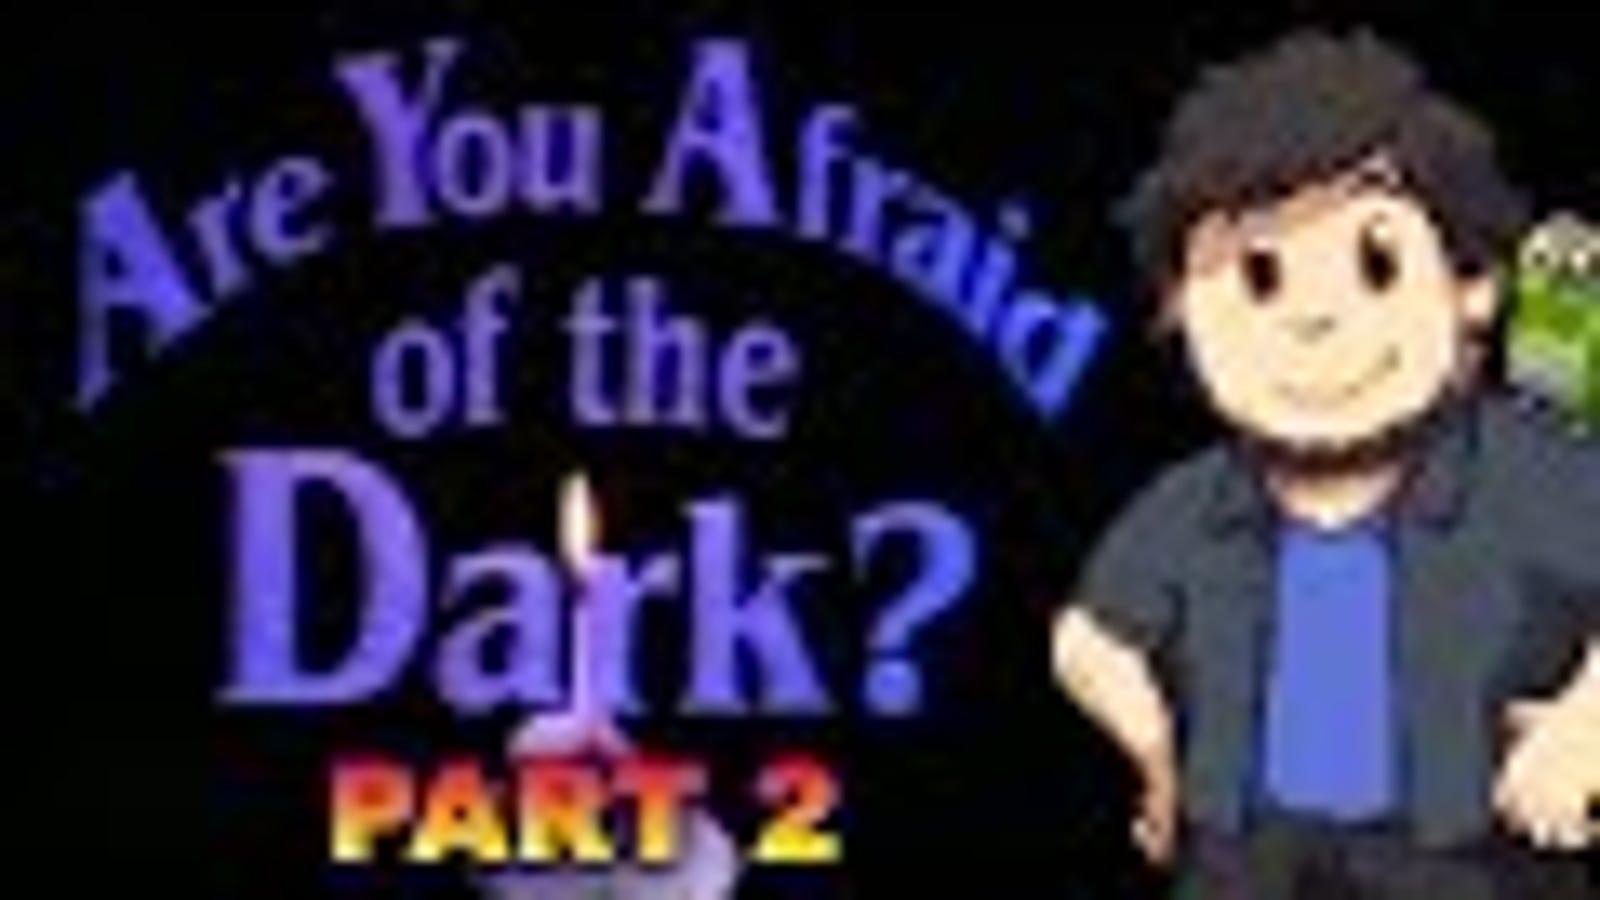 JonTron - Are You Afraid of the Dark? (PART 2)